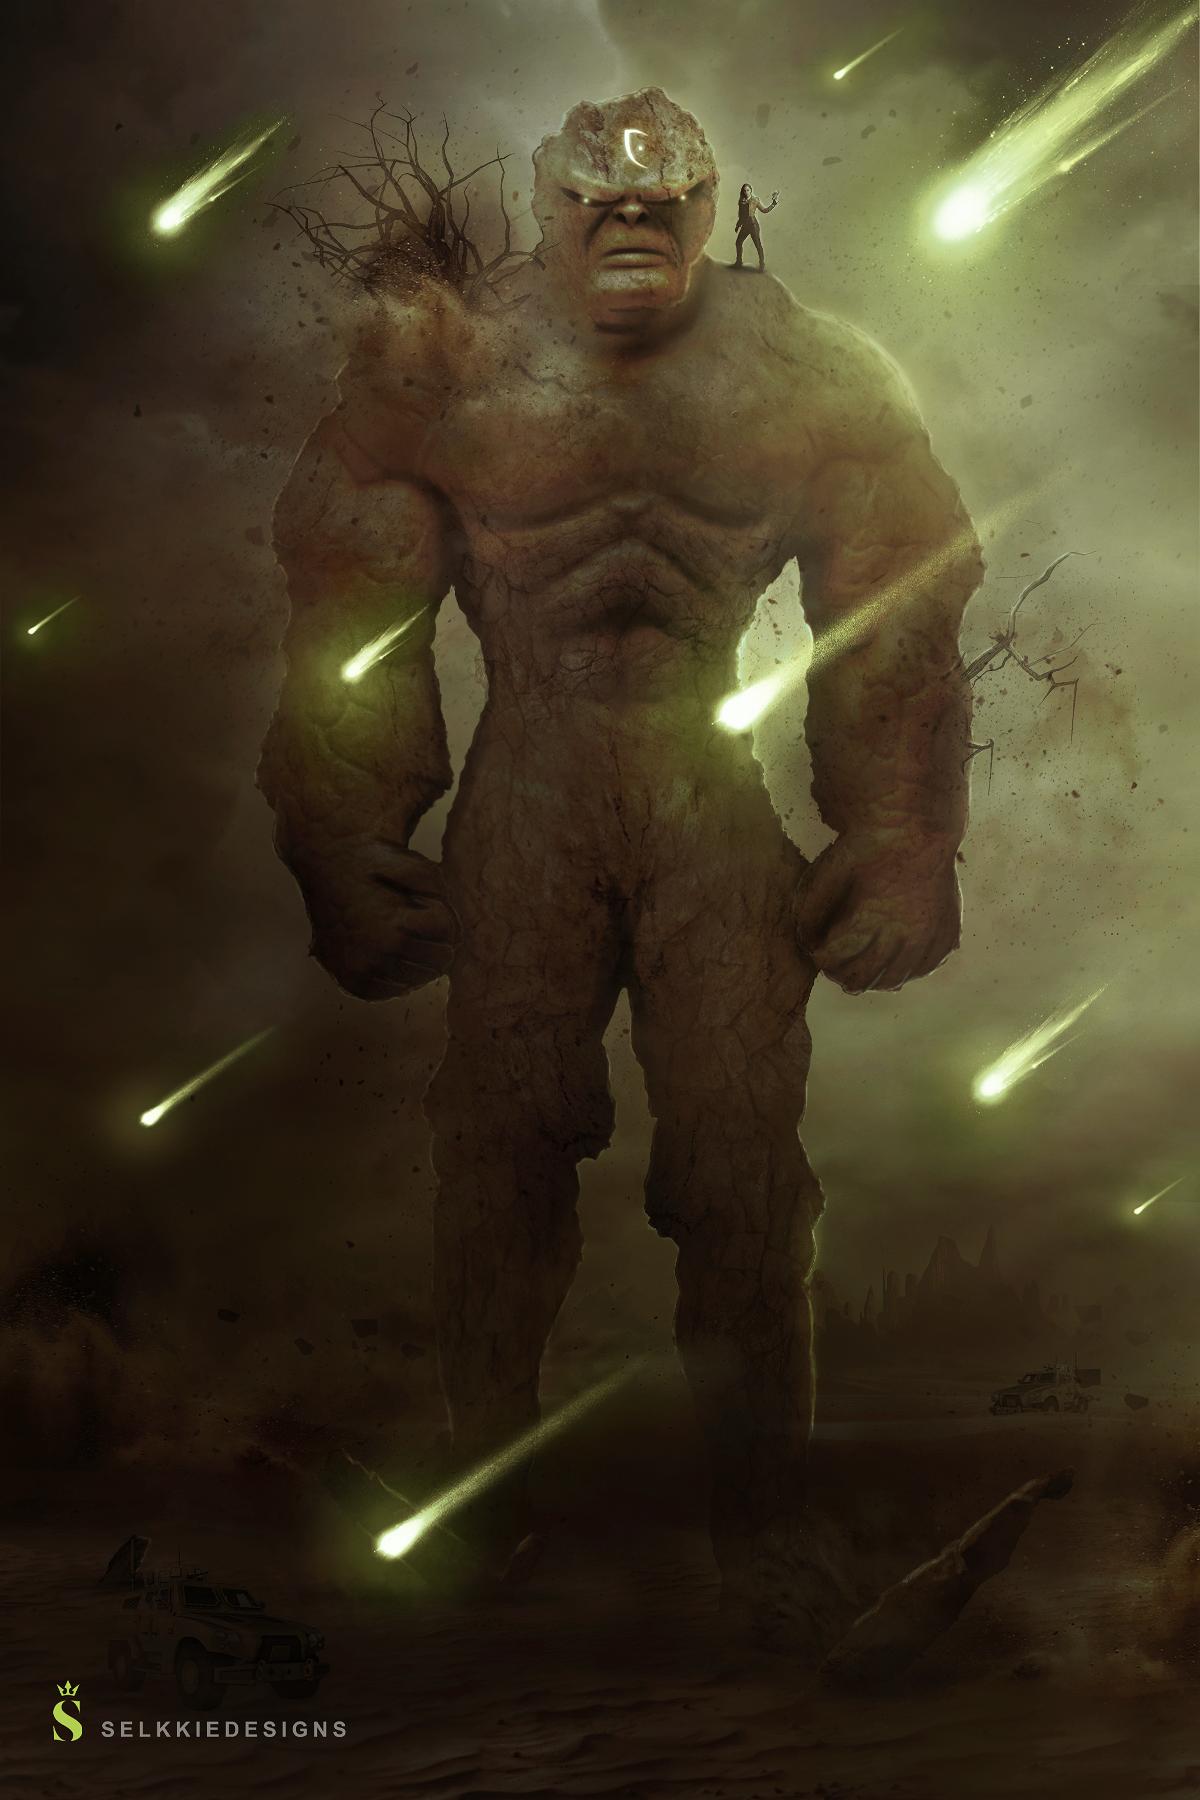 Stone Giant - Manipulation Nr. 16